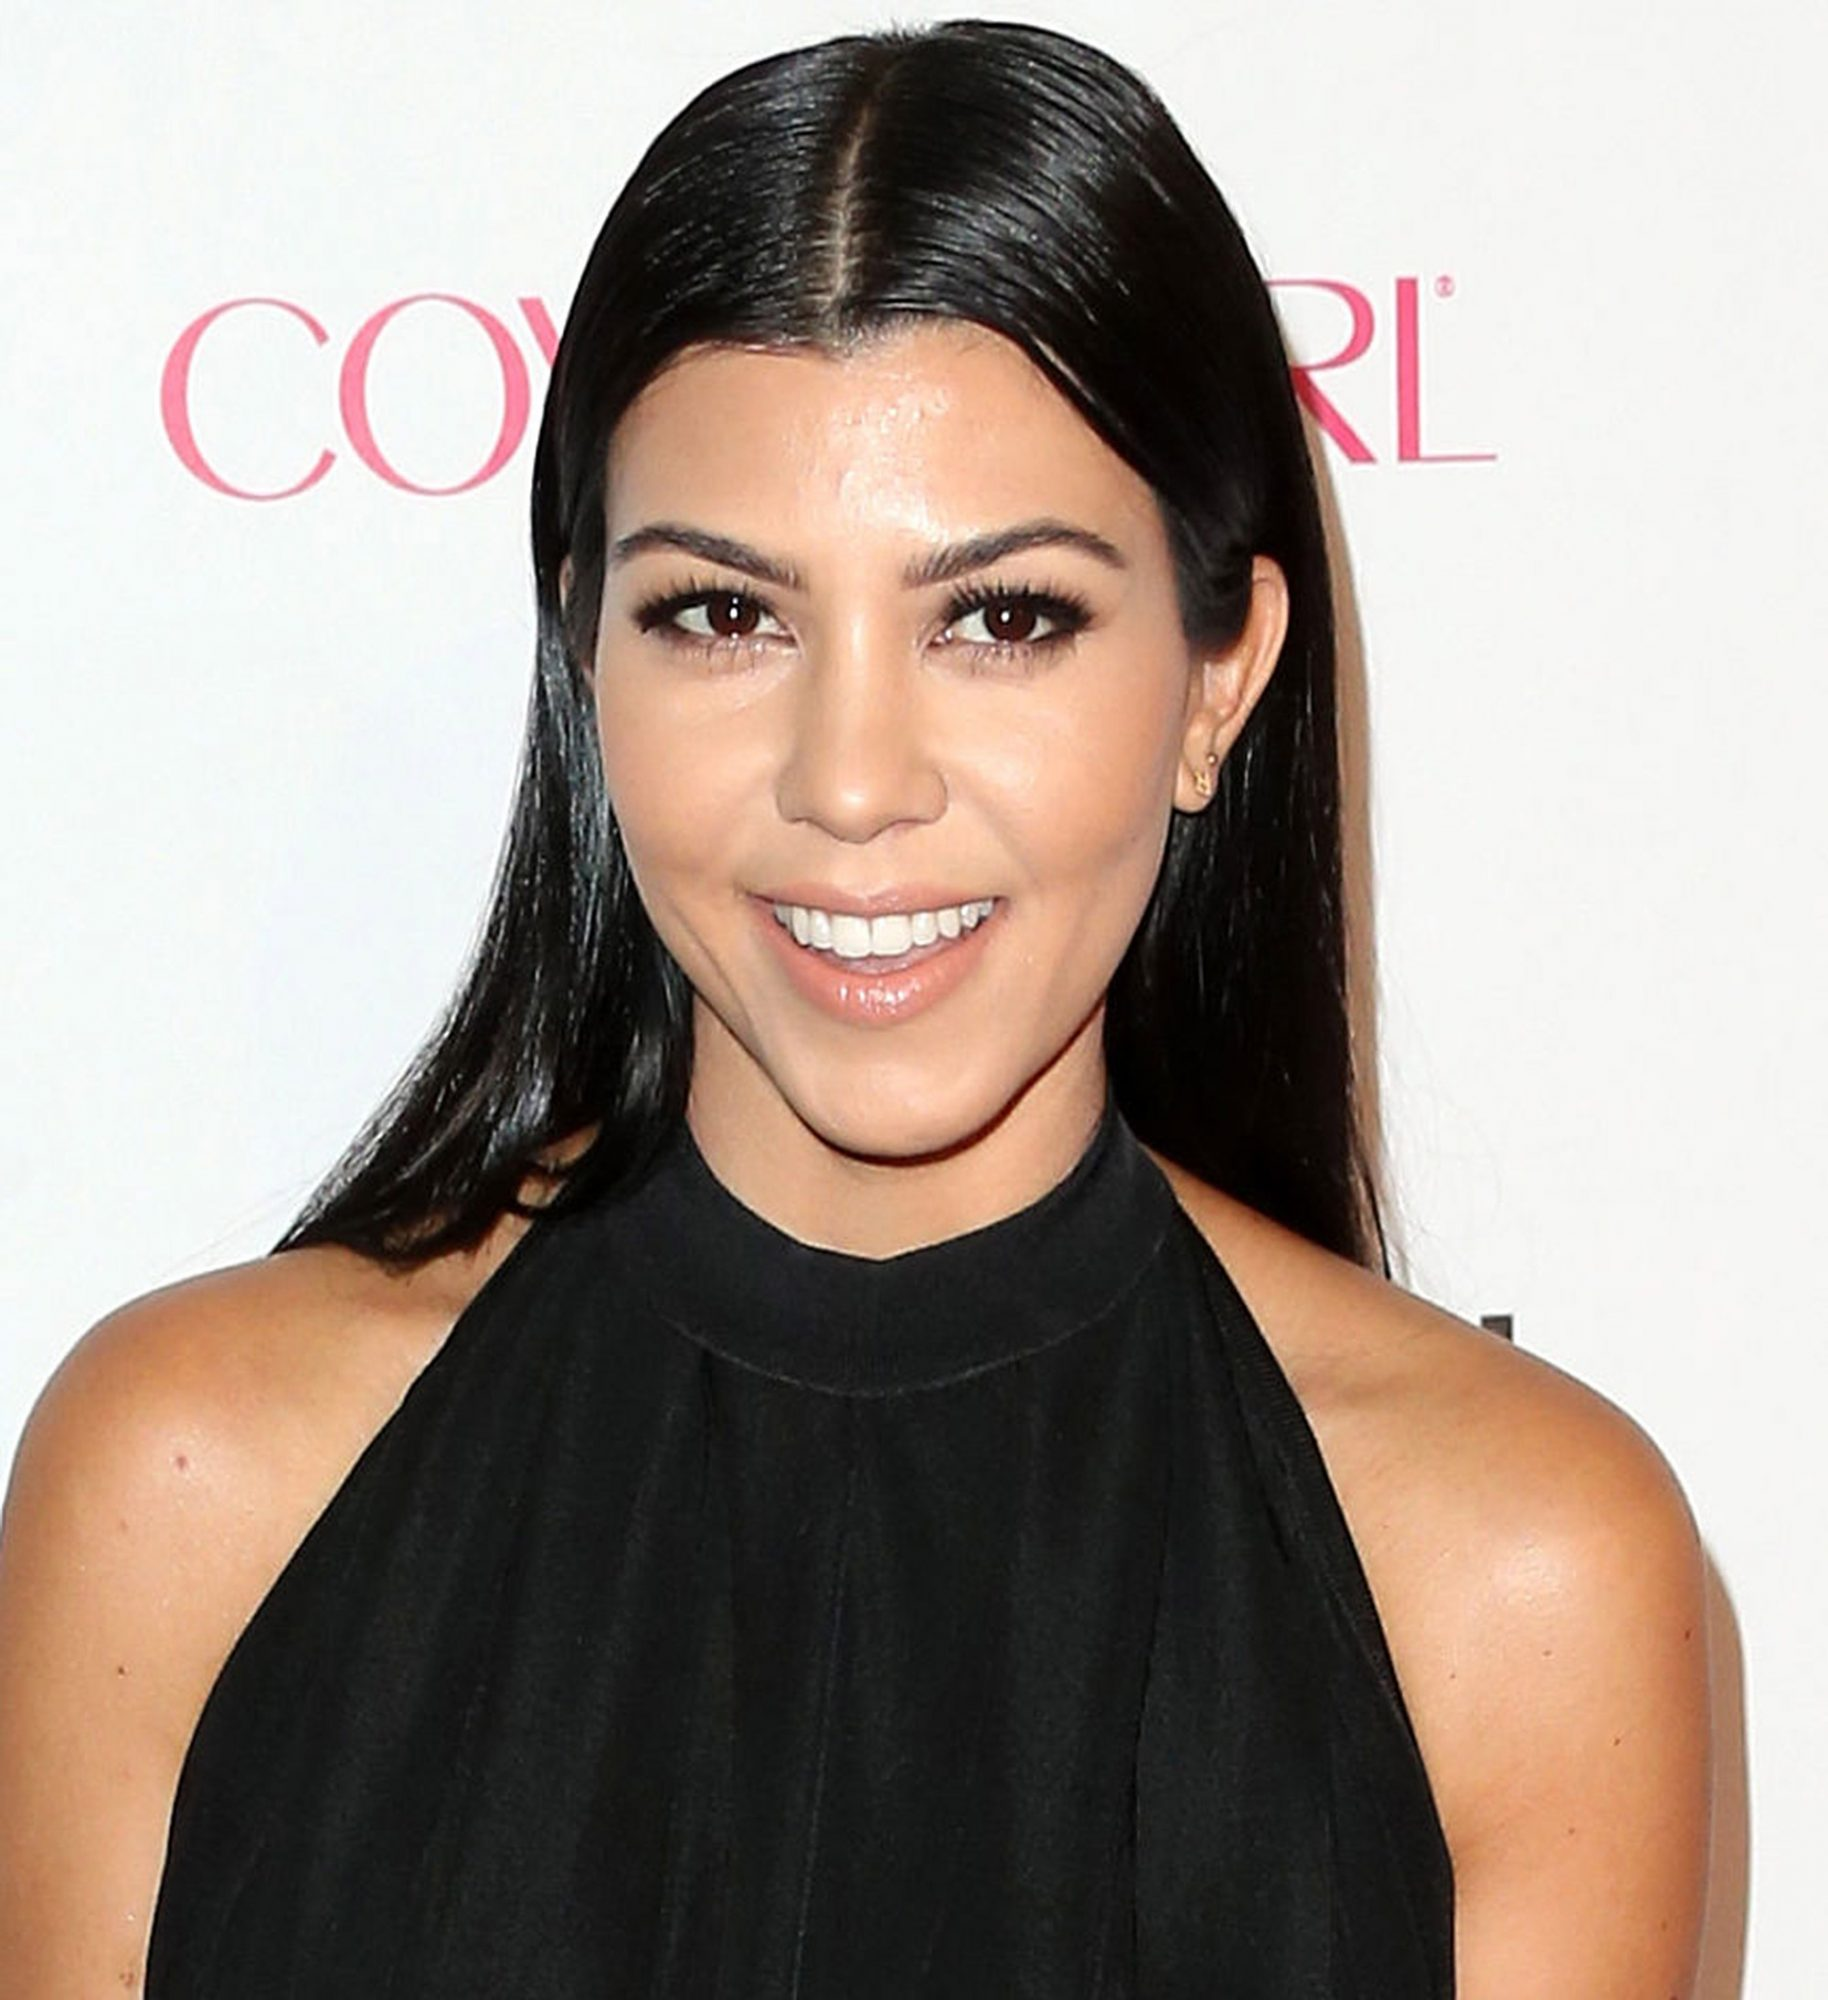 Kourtney Kardashian Shares Her 'Favorite Cookie Recipe Ever'